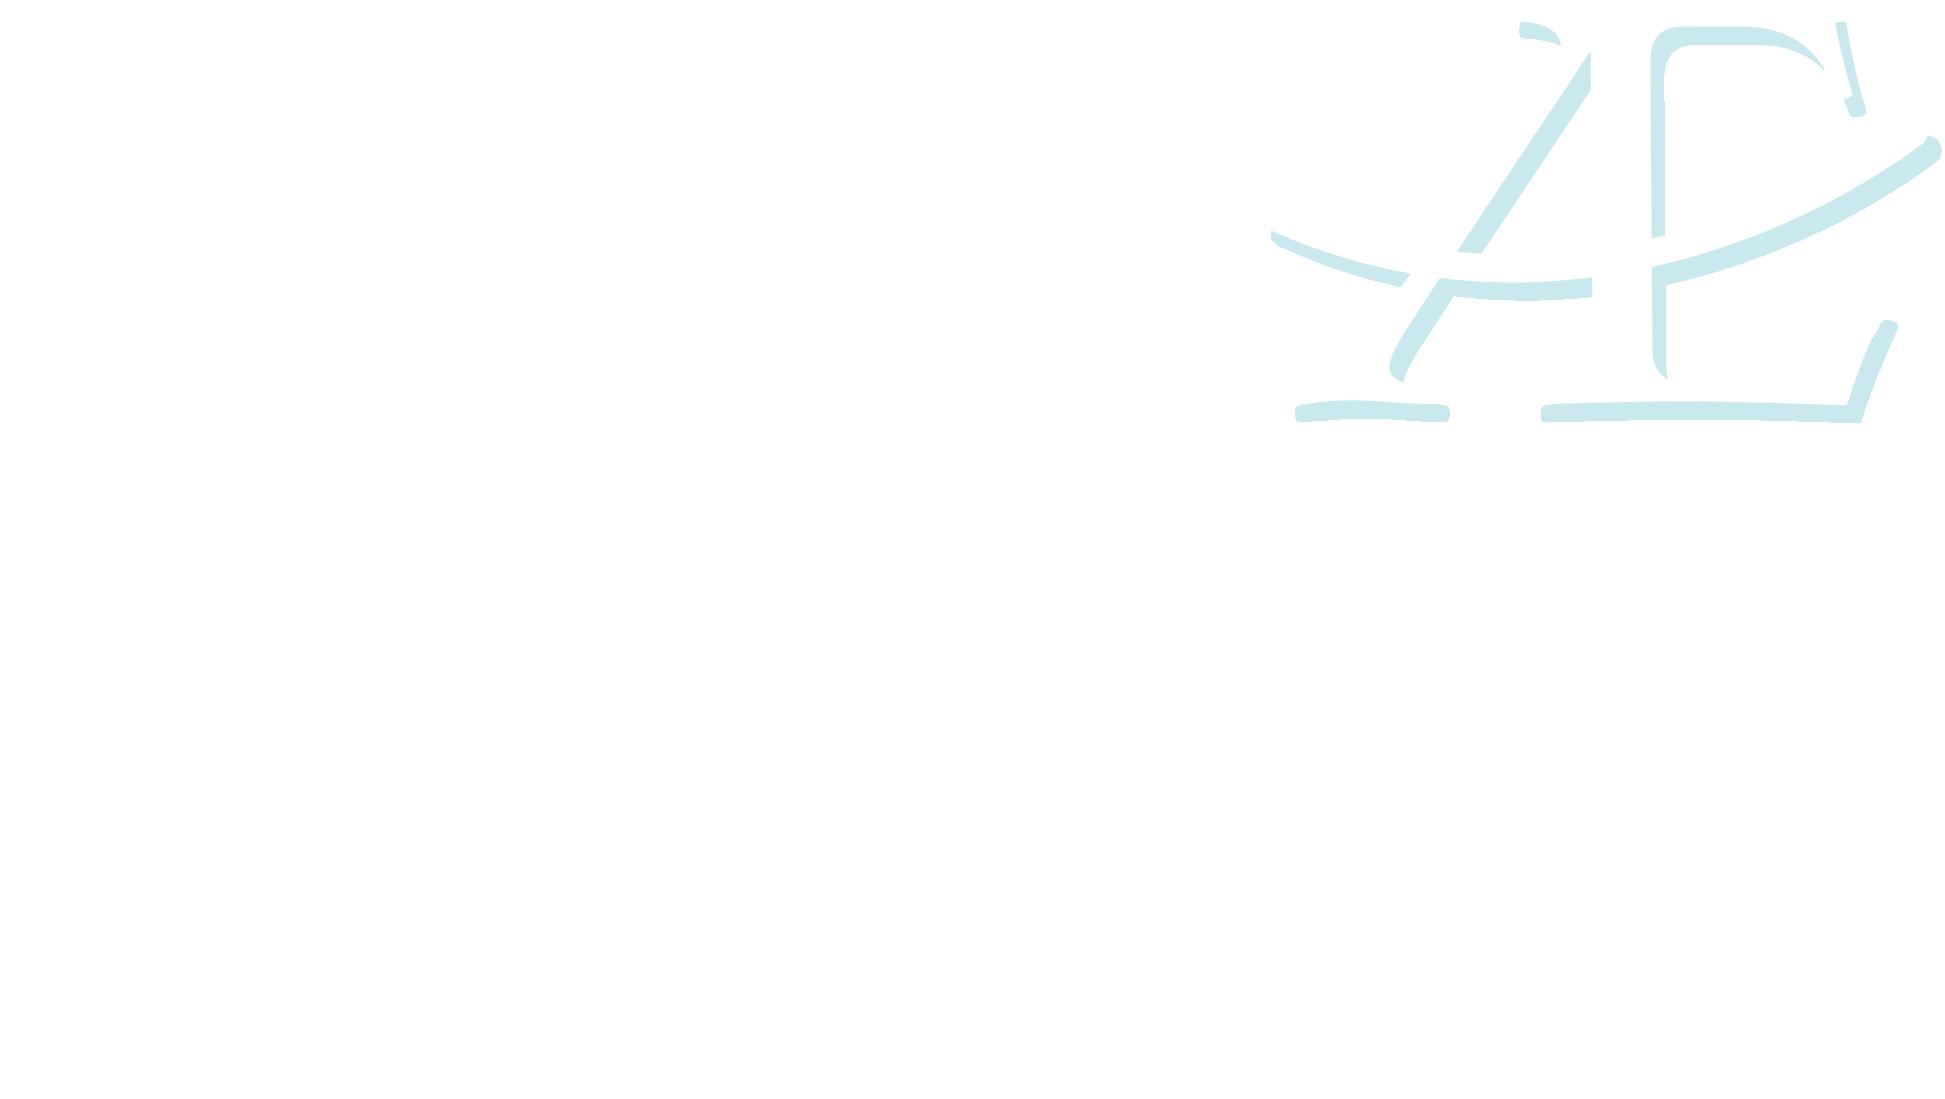 Aquæ Panorama 4 novembre 2019